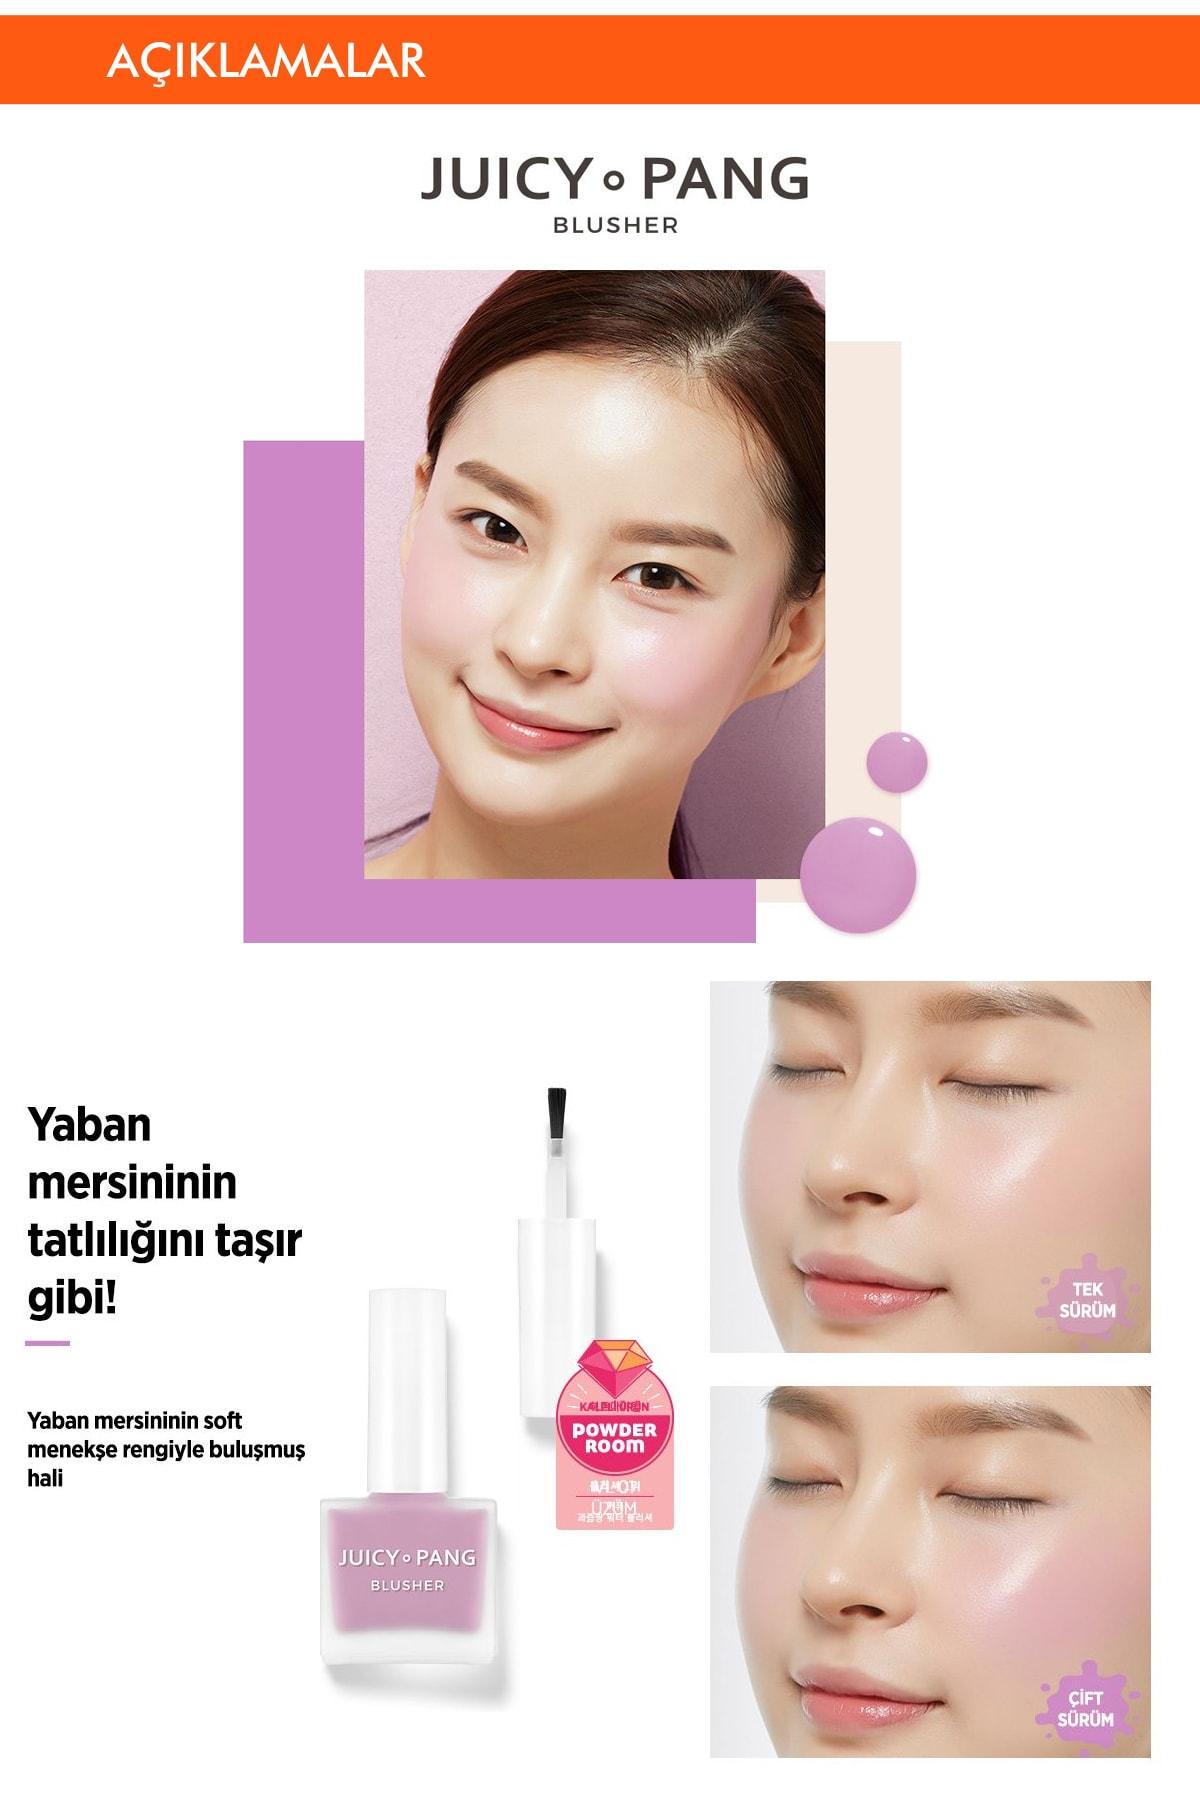 Missha Doğal Görünüm Sunan Nemlendirici Likit Allık 9g. APIEU Juicy-Pang Water Blusher (VL02) 2